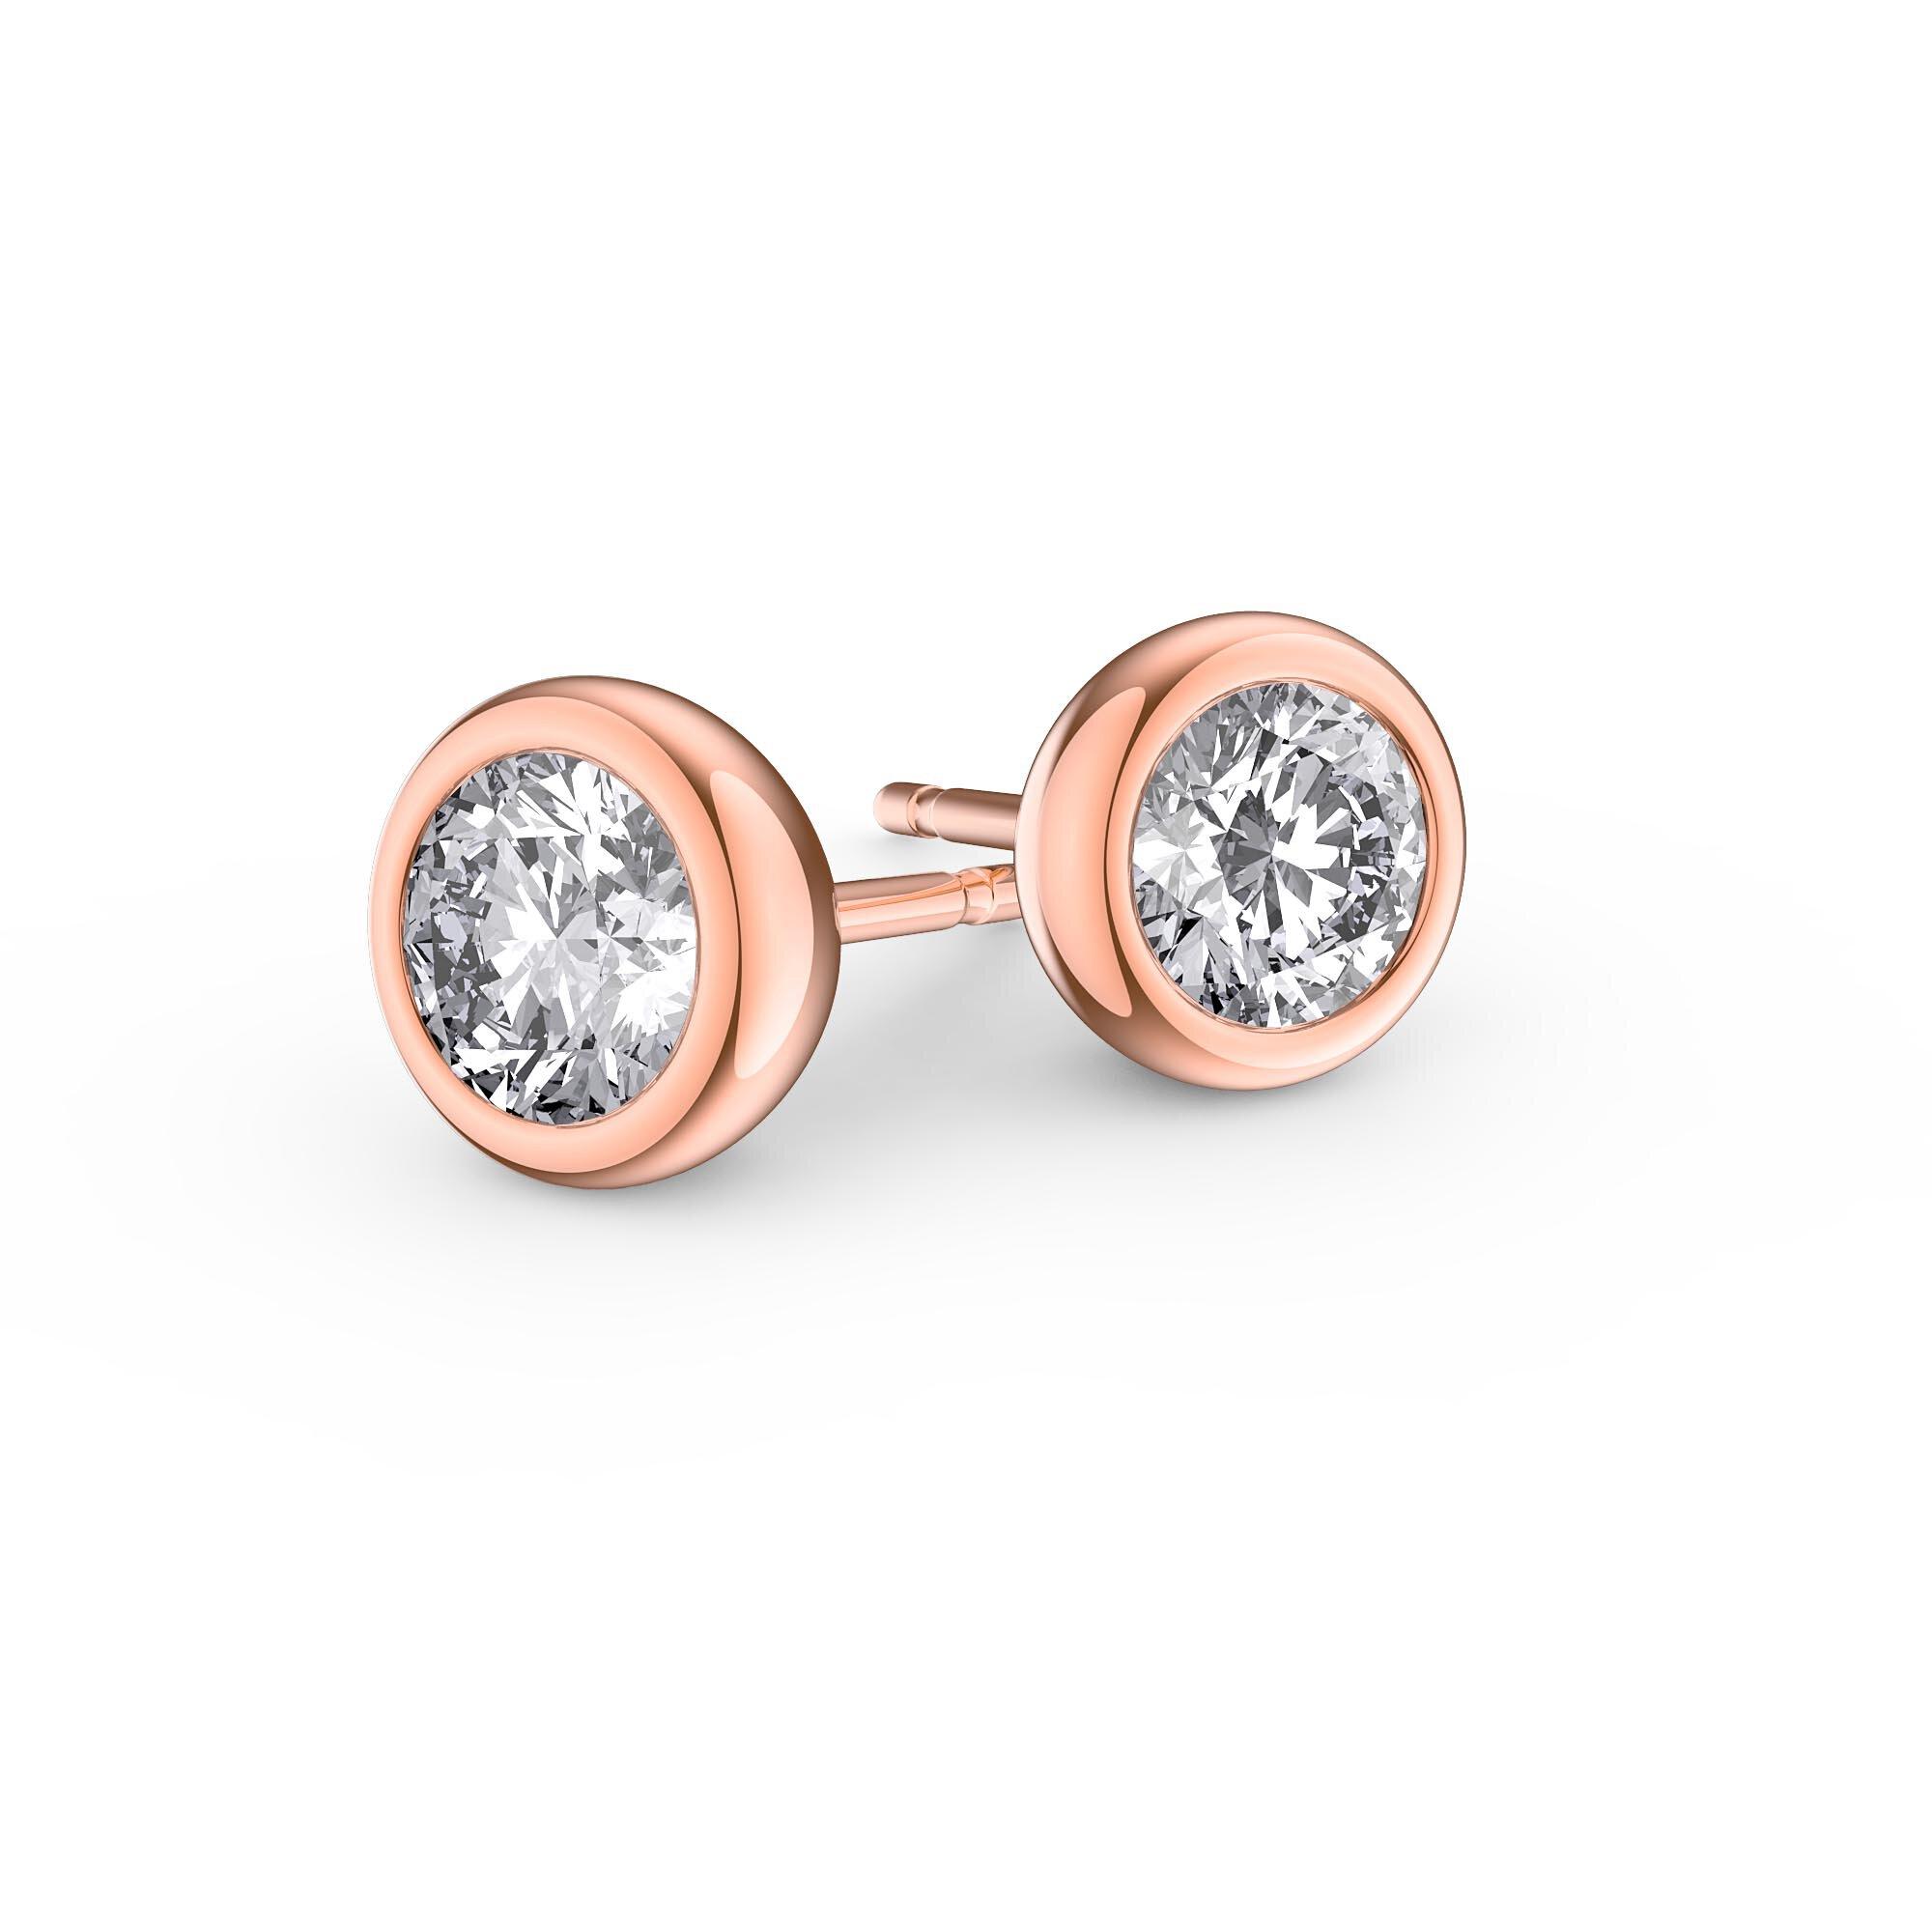 Infinity Diamond 18ct Rose Gold Stud Earrings Jian London